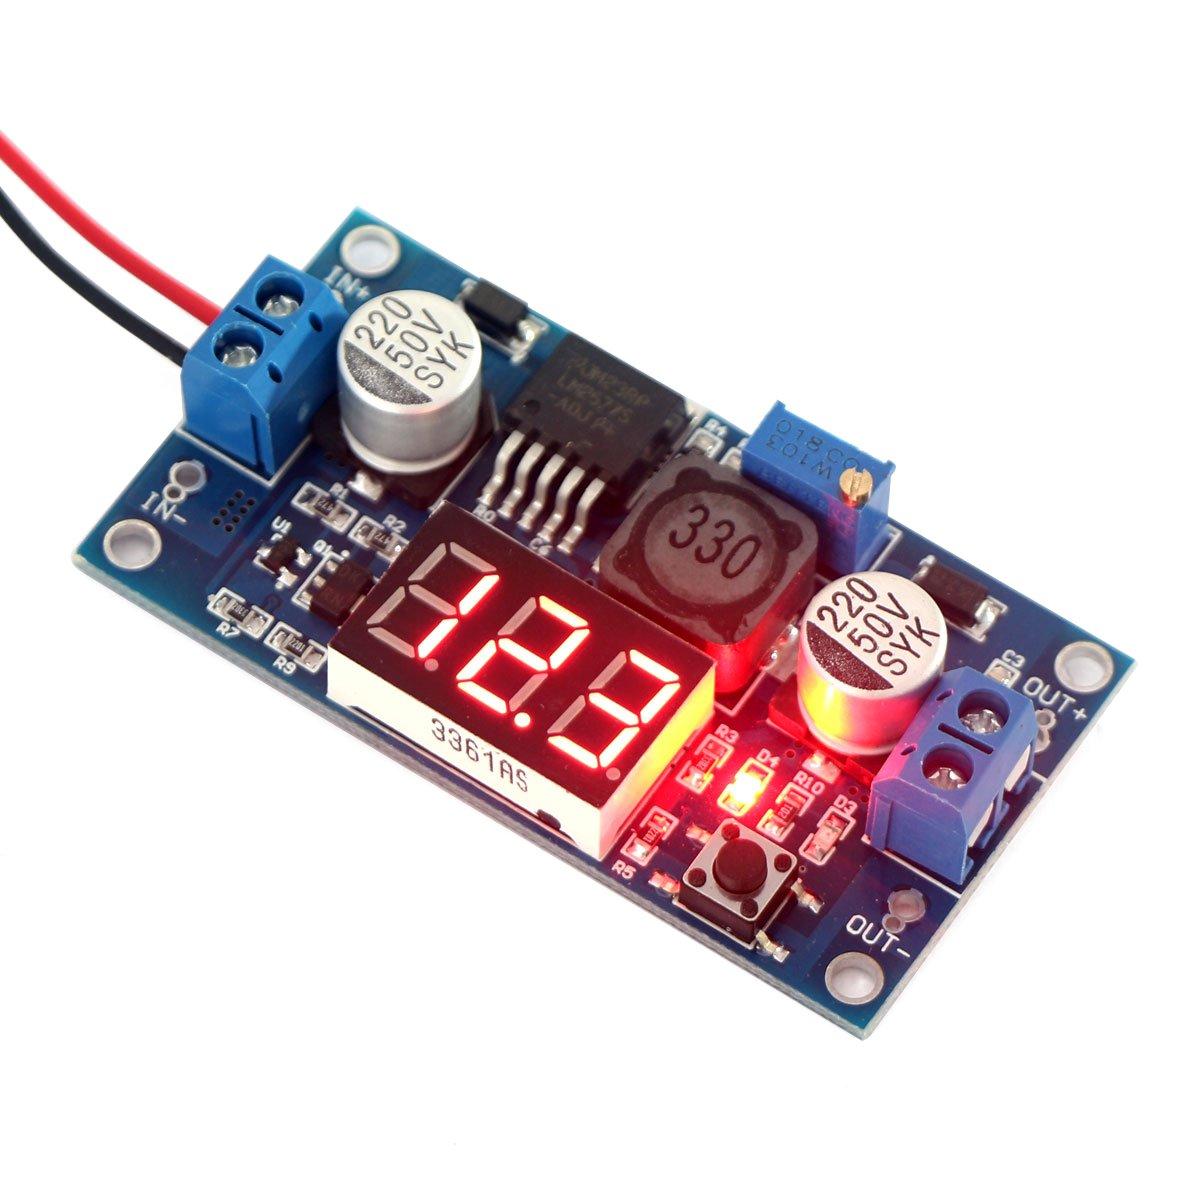 Drok Micro Led DcDc Digital Boost Voltage Converter Adjustable Volt Regulator Board Module Power Supply Transformer